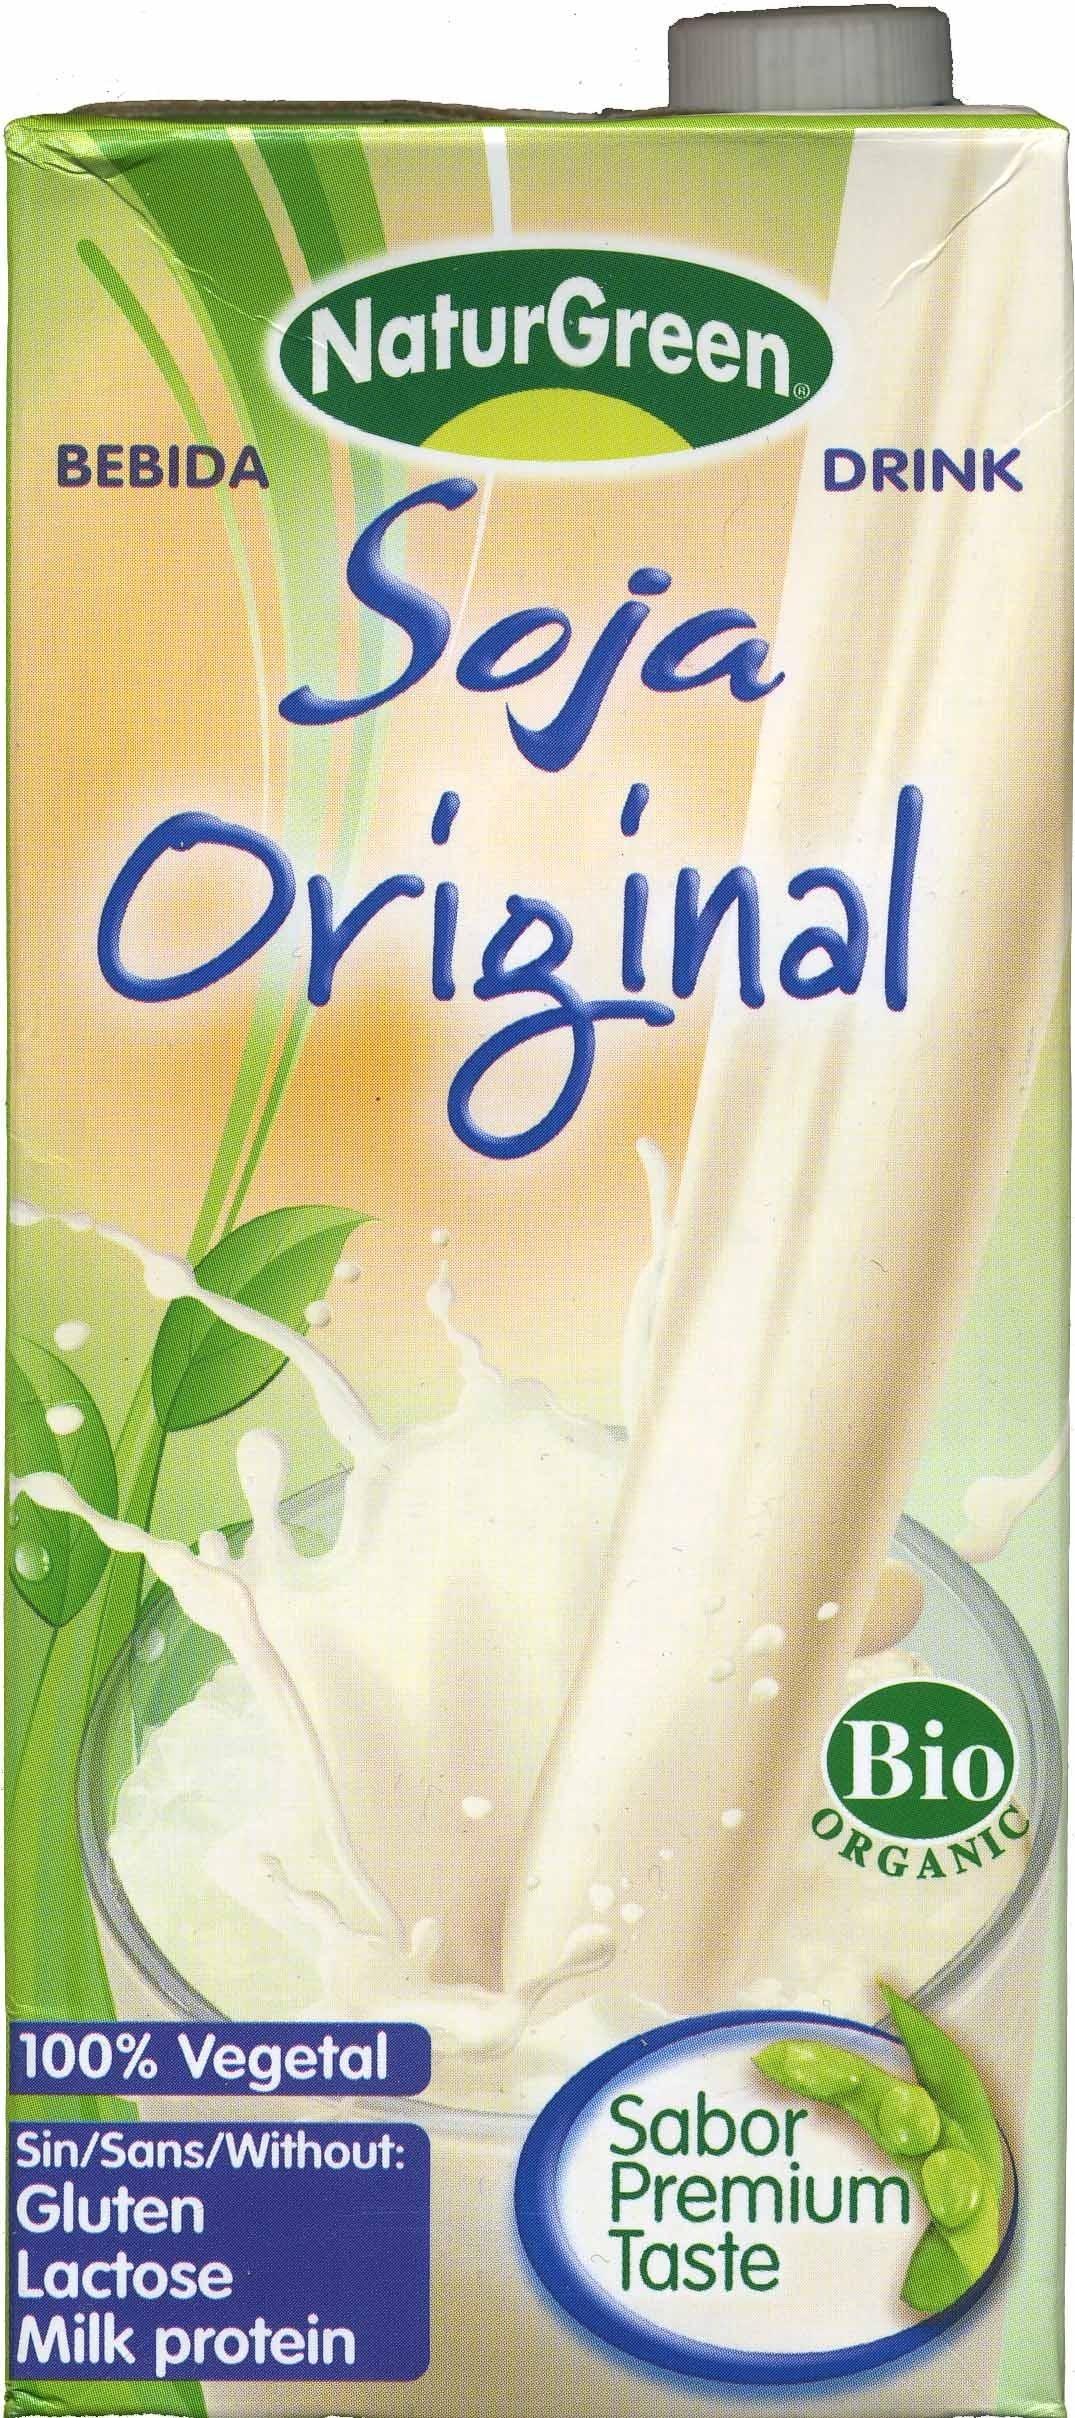 Bebida de soja Original - Product - es